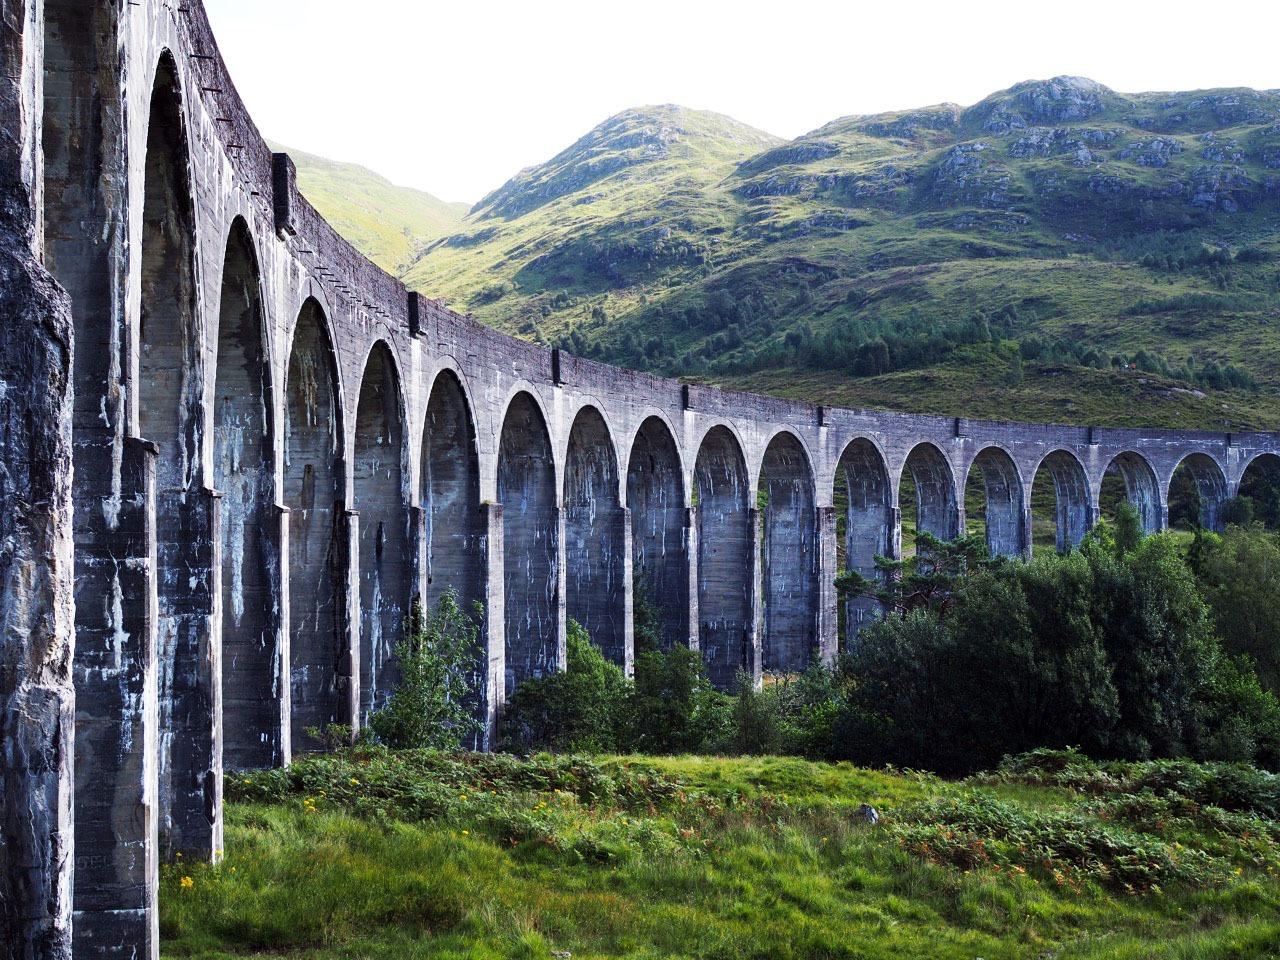 Harry Potter filmreeks  Wikipedia